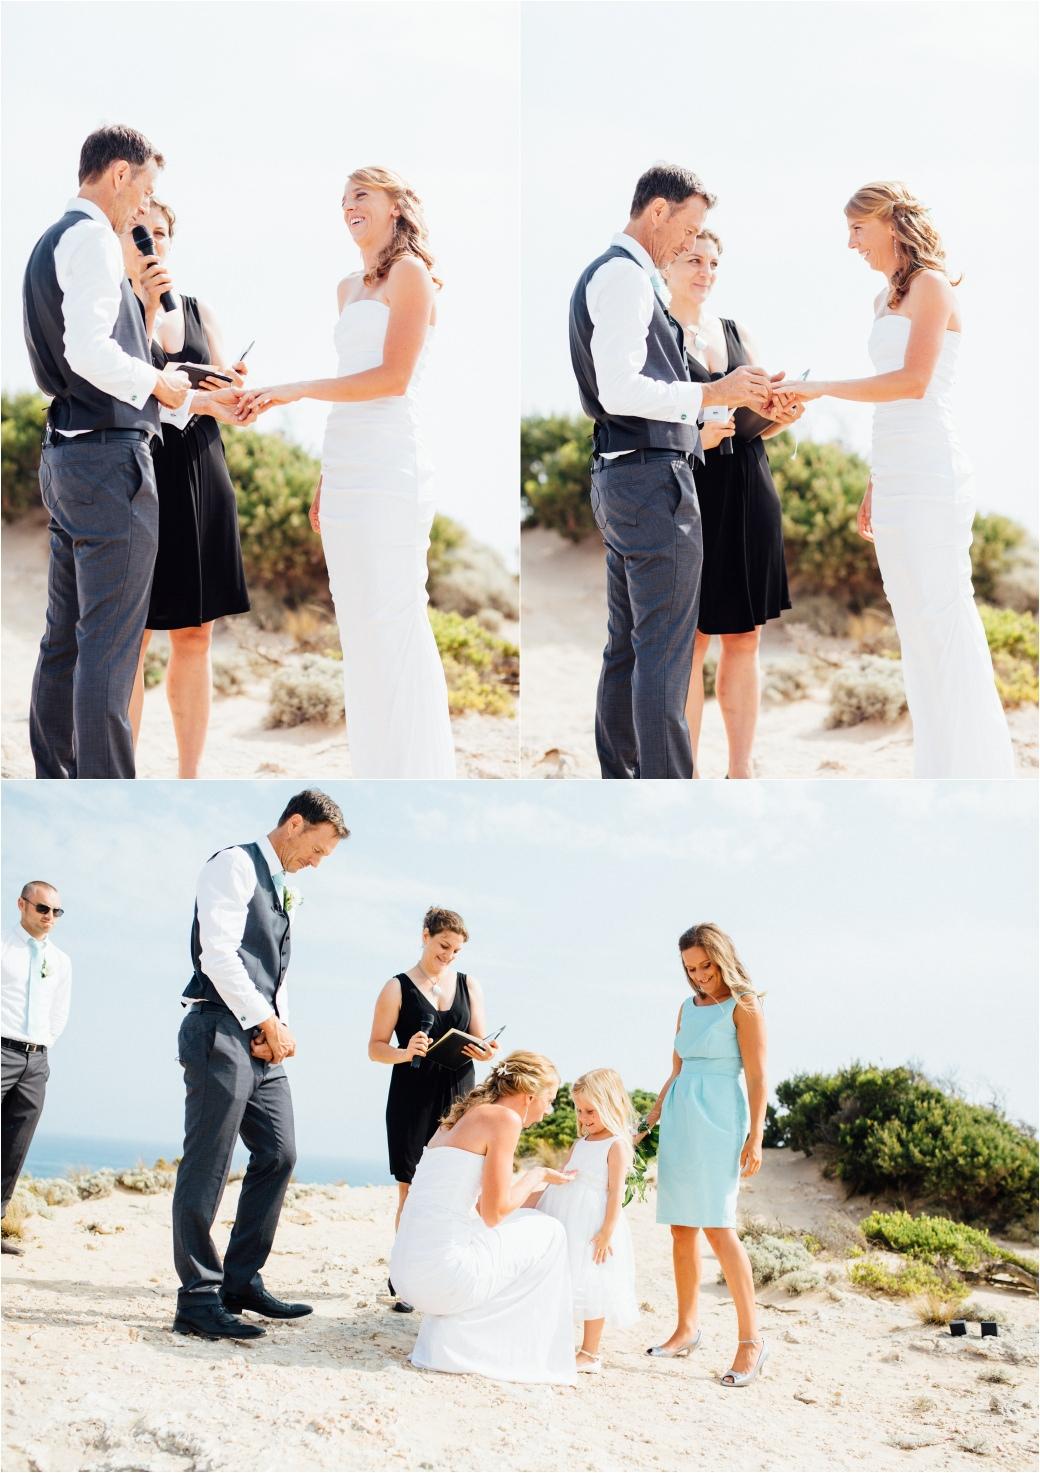 hanwin triathlon taco truck sorrento australian beach witsup wedding day melbourne wedding hyggelig photography044